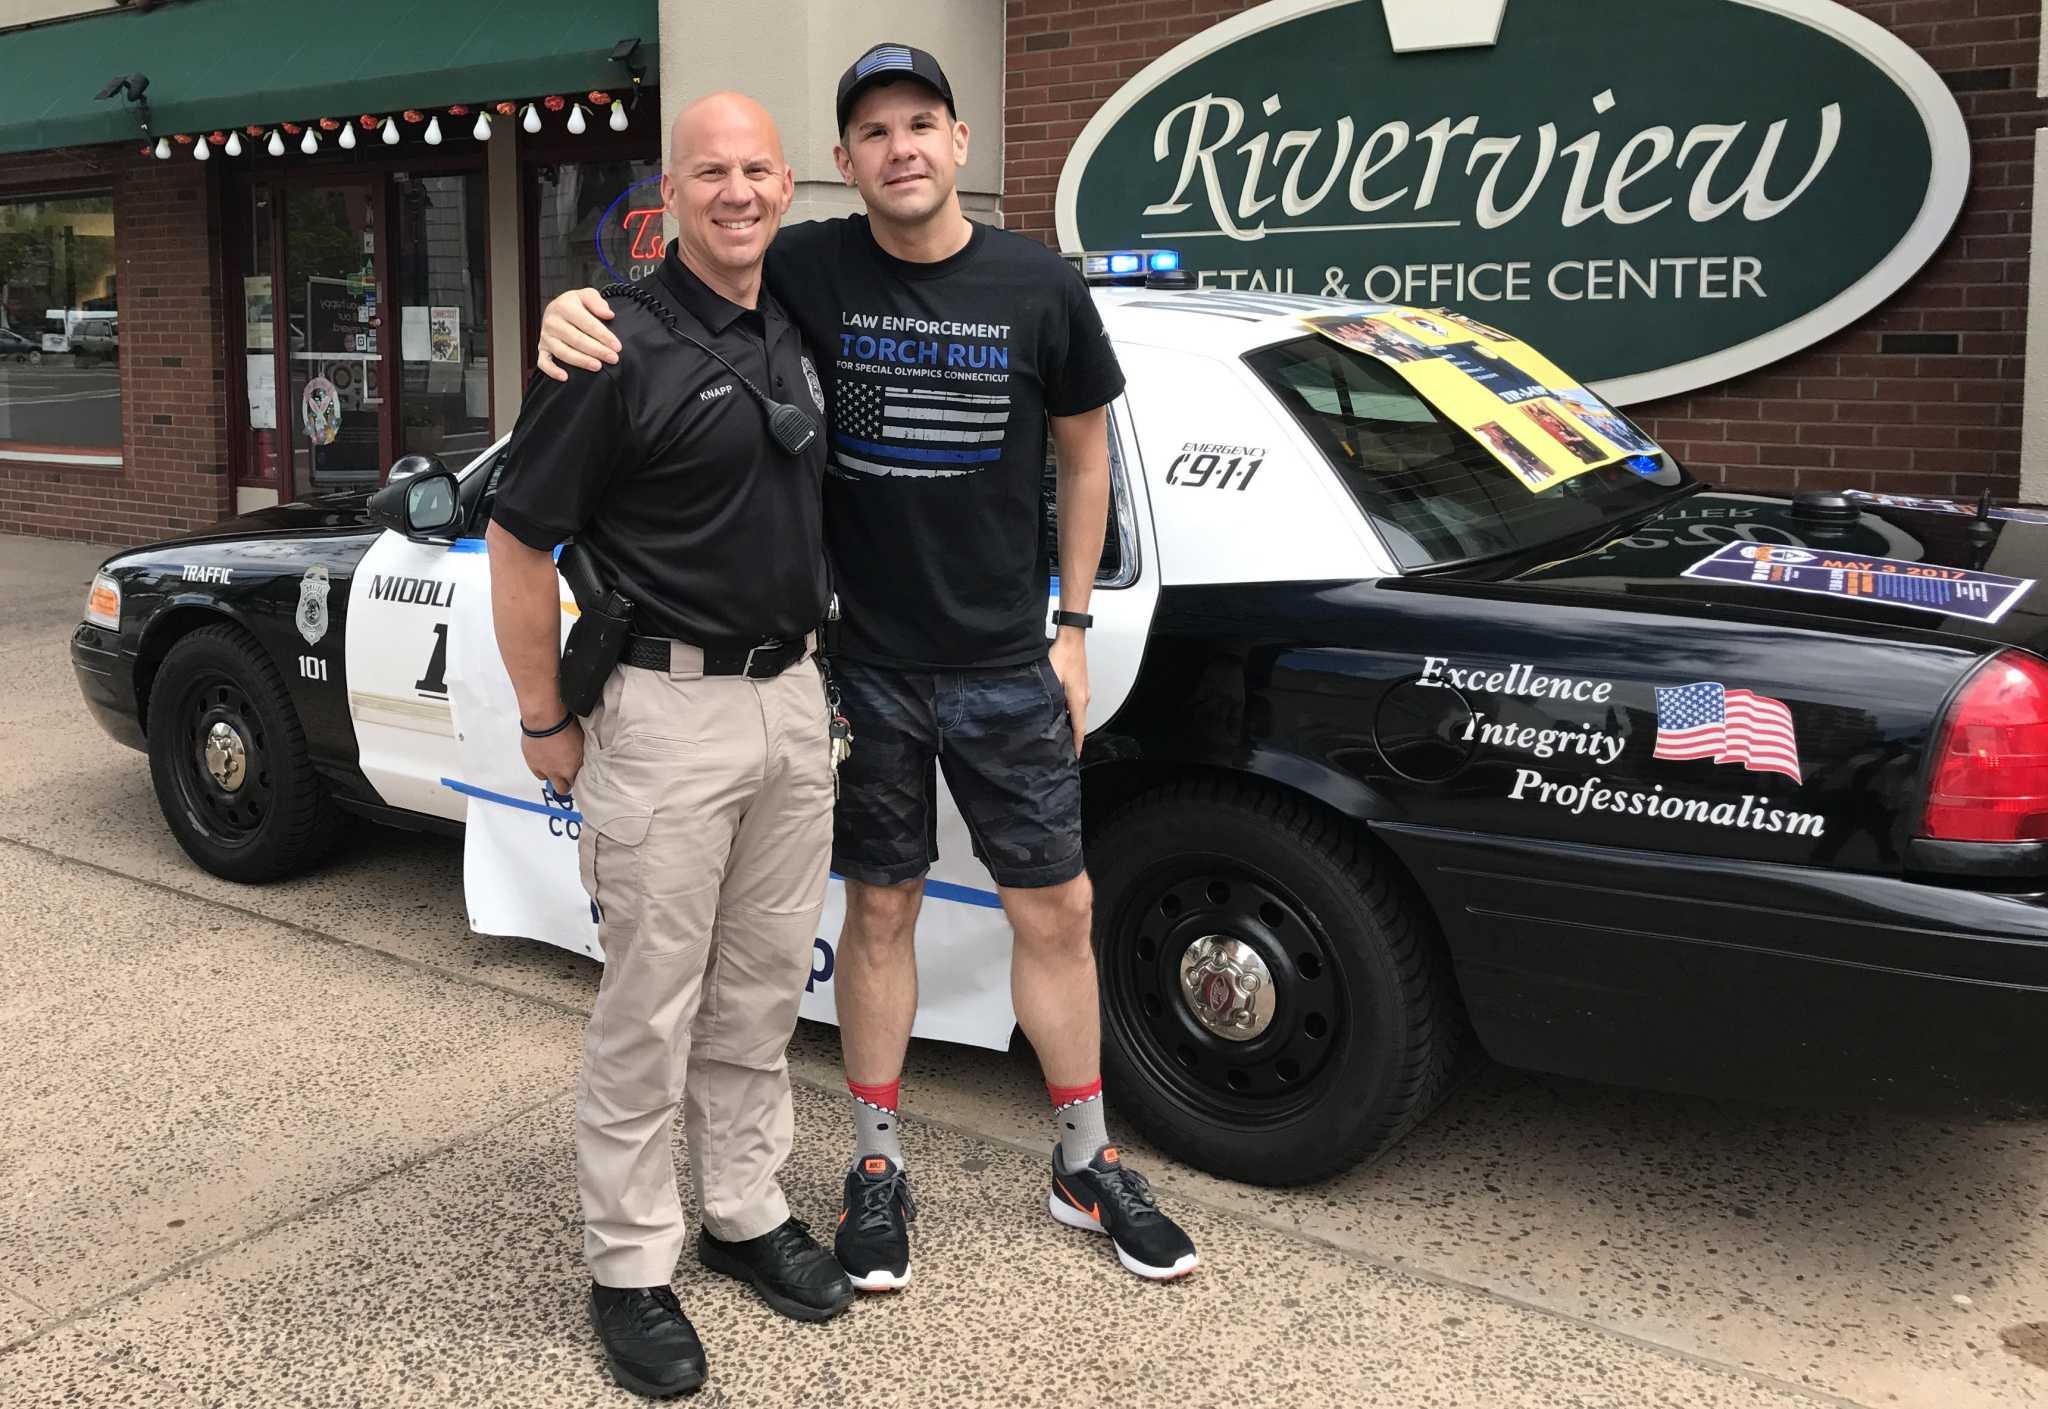 middletown cops  other law enforcement officers hosting